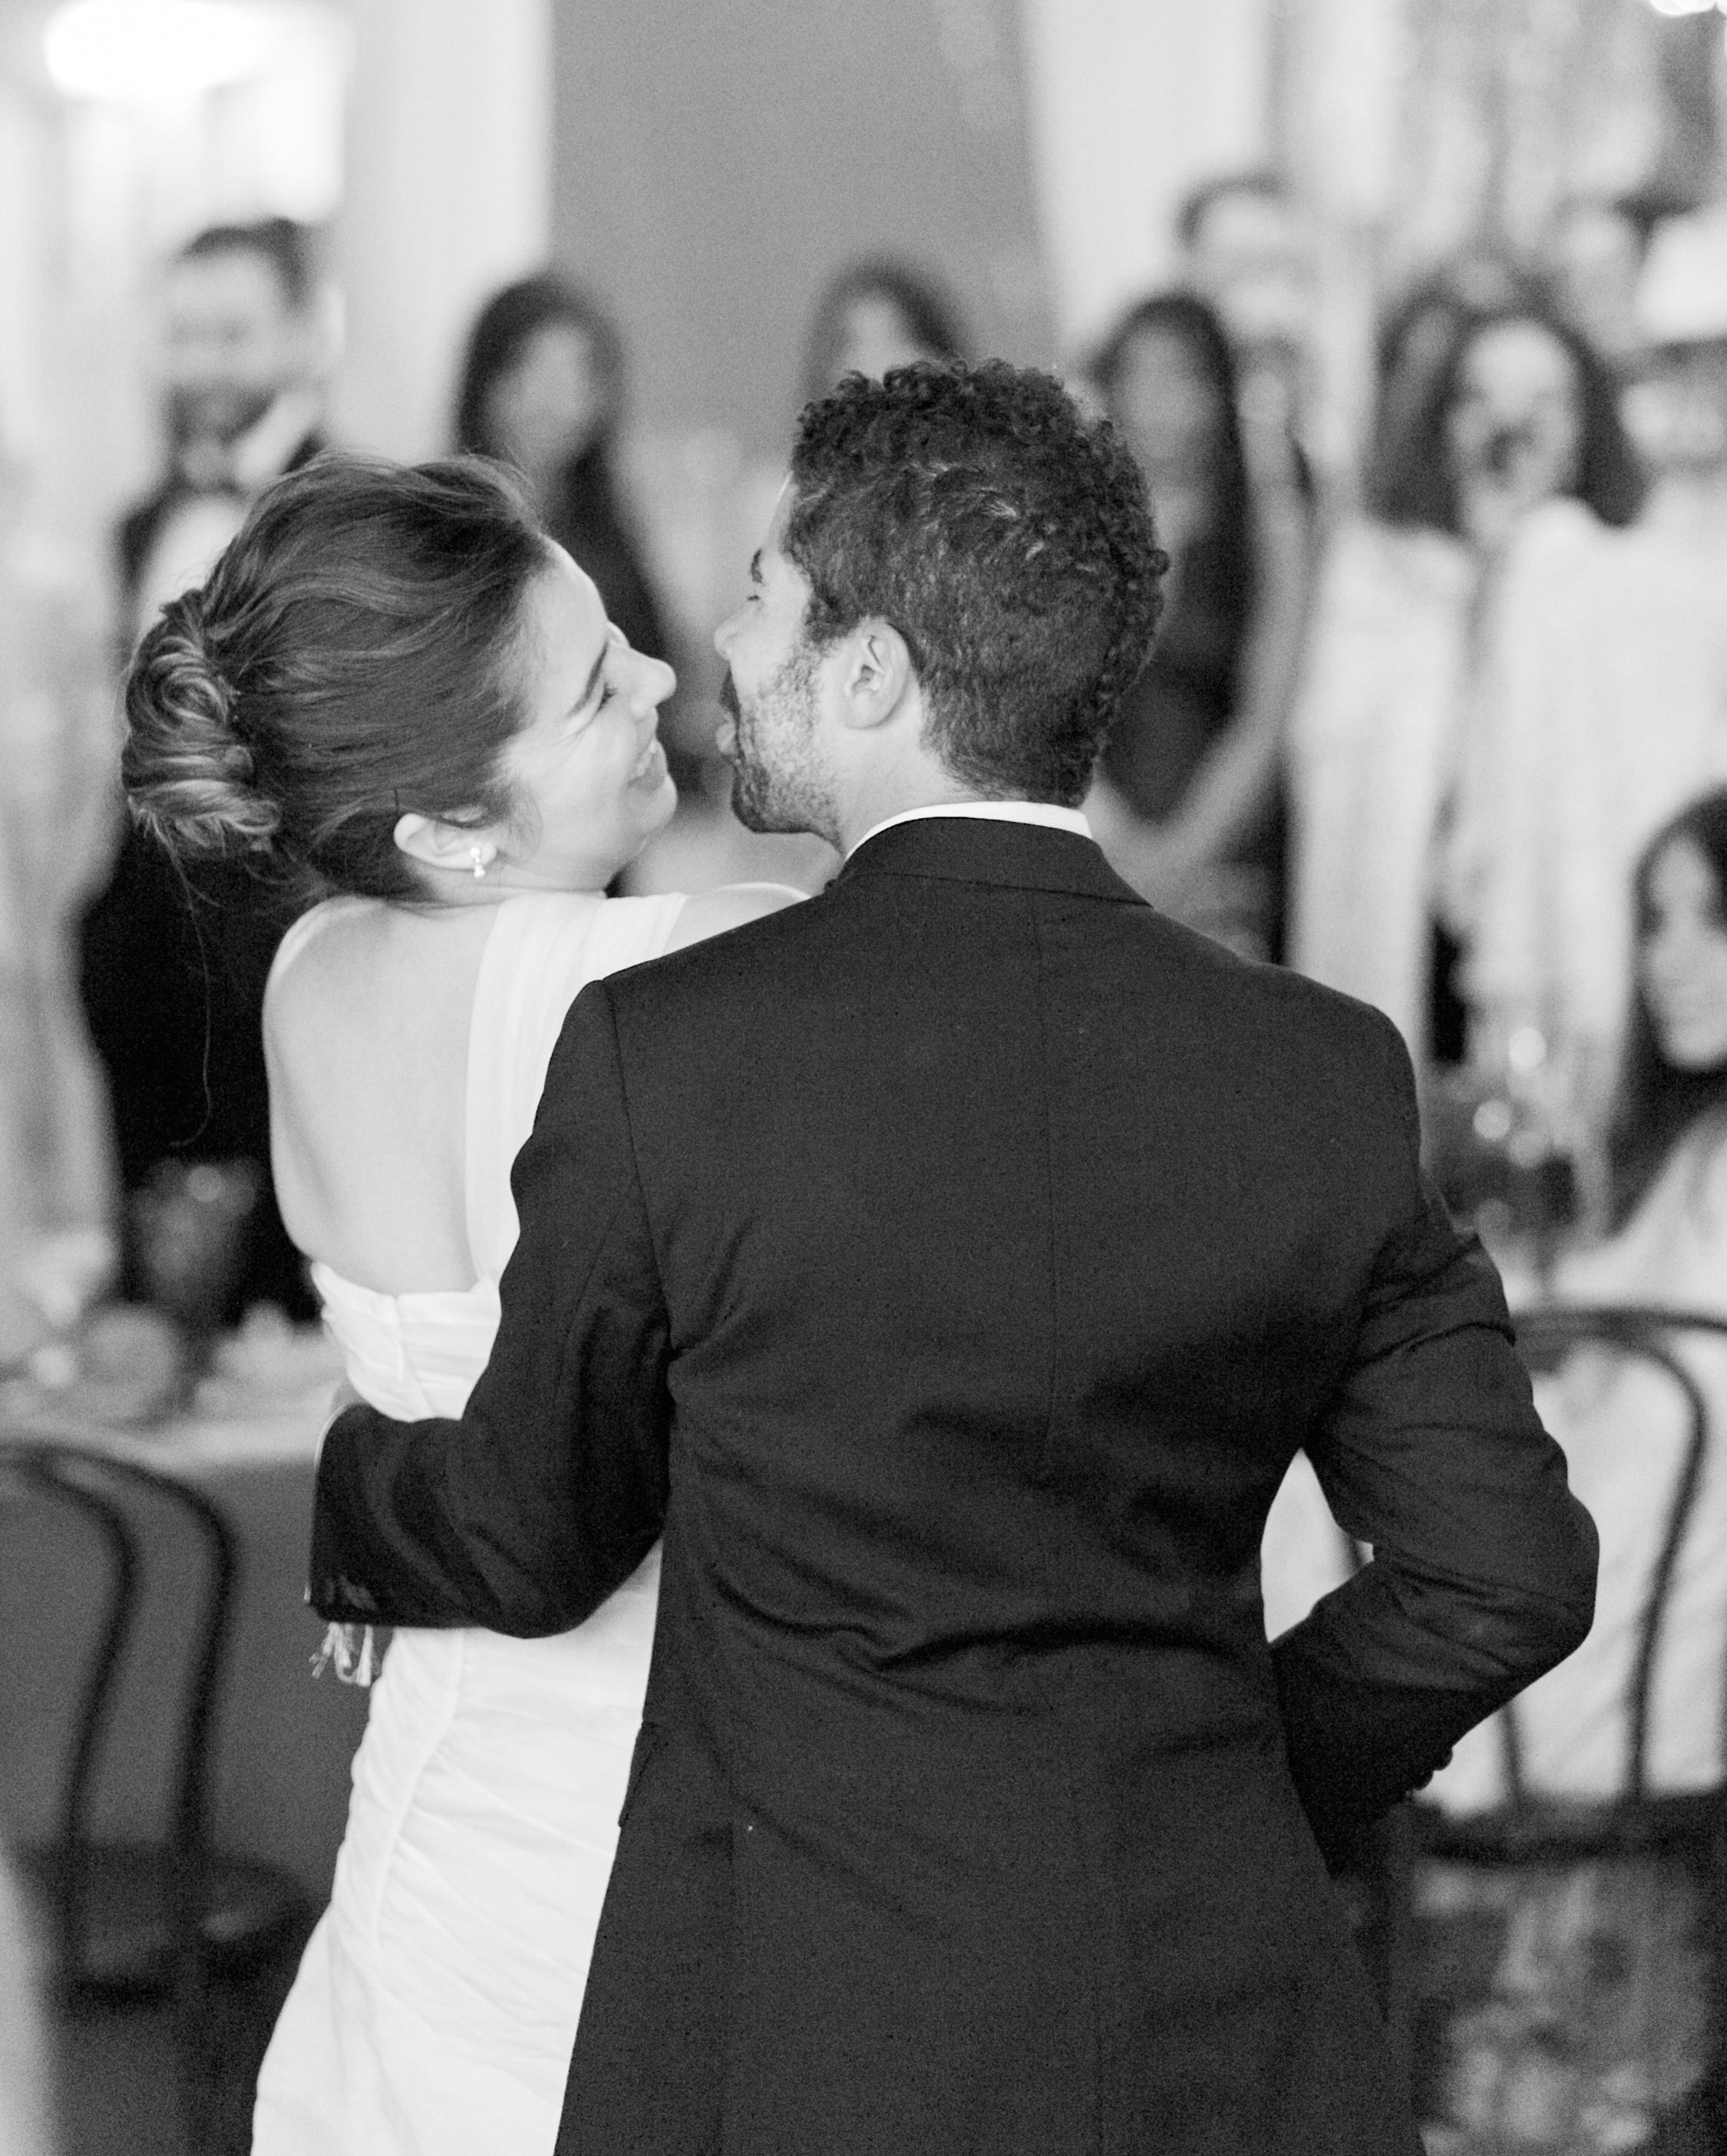 stacey-adam-wedding-dance-0095-s112112-0815.jpg